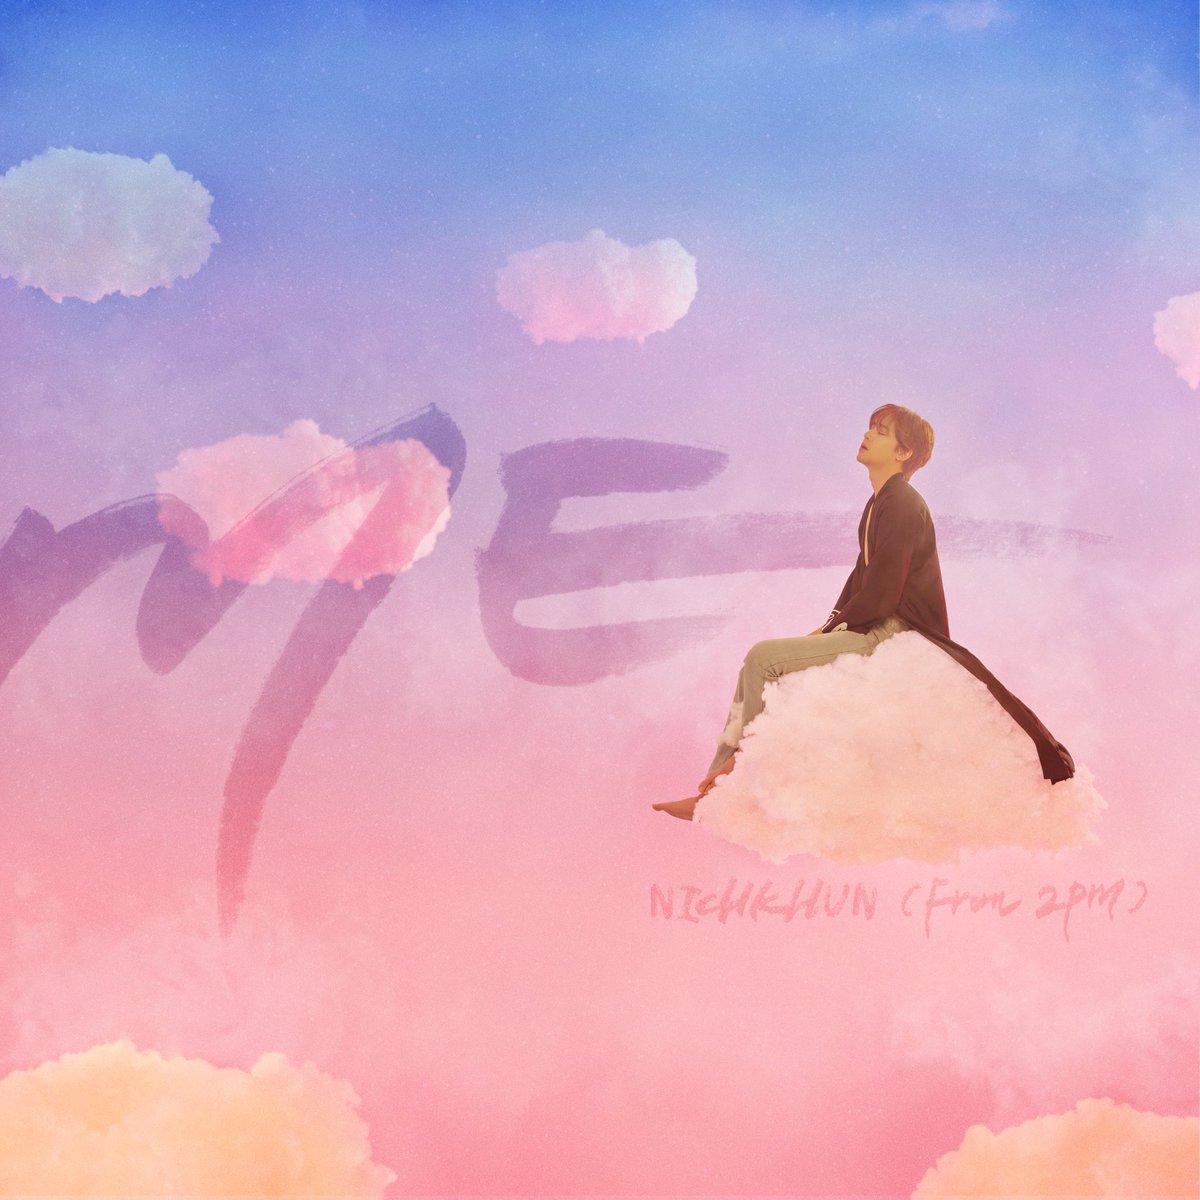 NICHKHUN (From 2PM) Japan Solo Mini Album <ME>   Release Date : 2018. 12. 19        https://t.co/snGGbcqCbY#2PM#NICHKHUN#닉쿤#ME#LuckyCharm